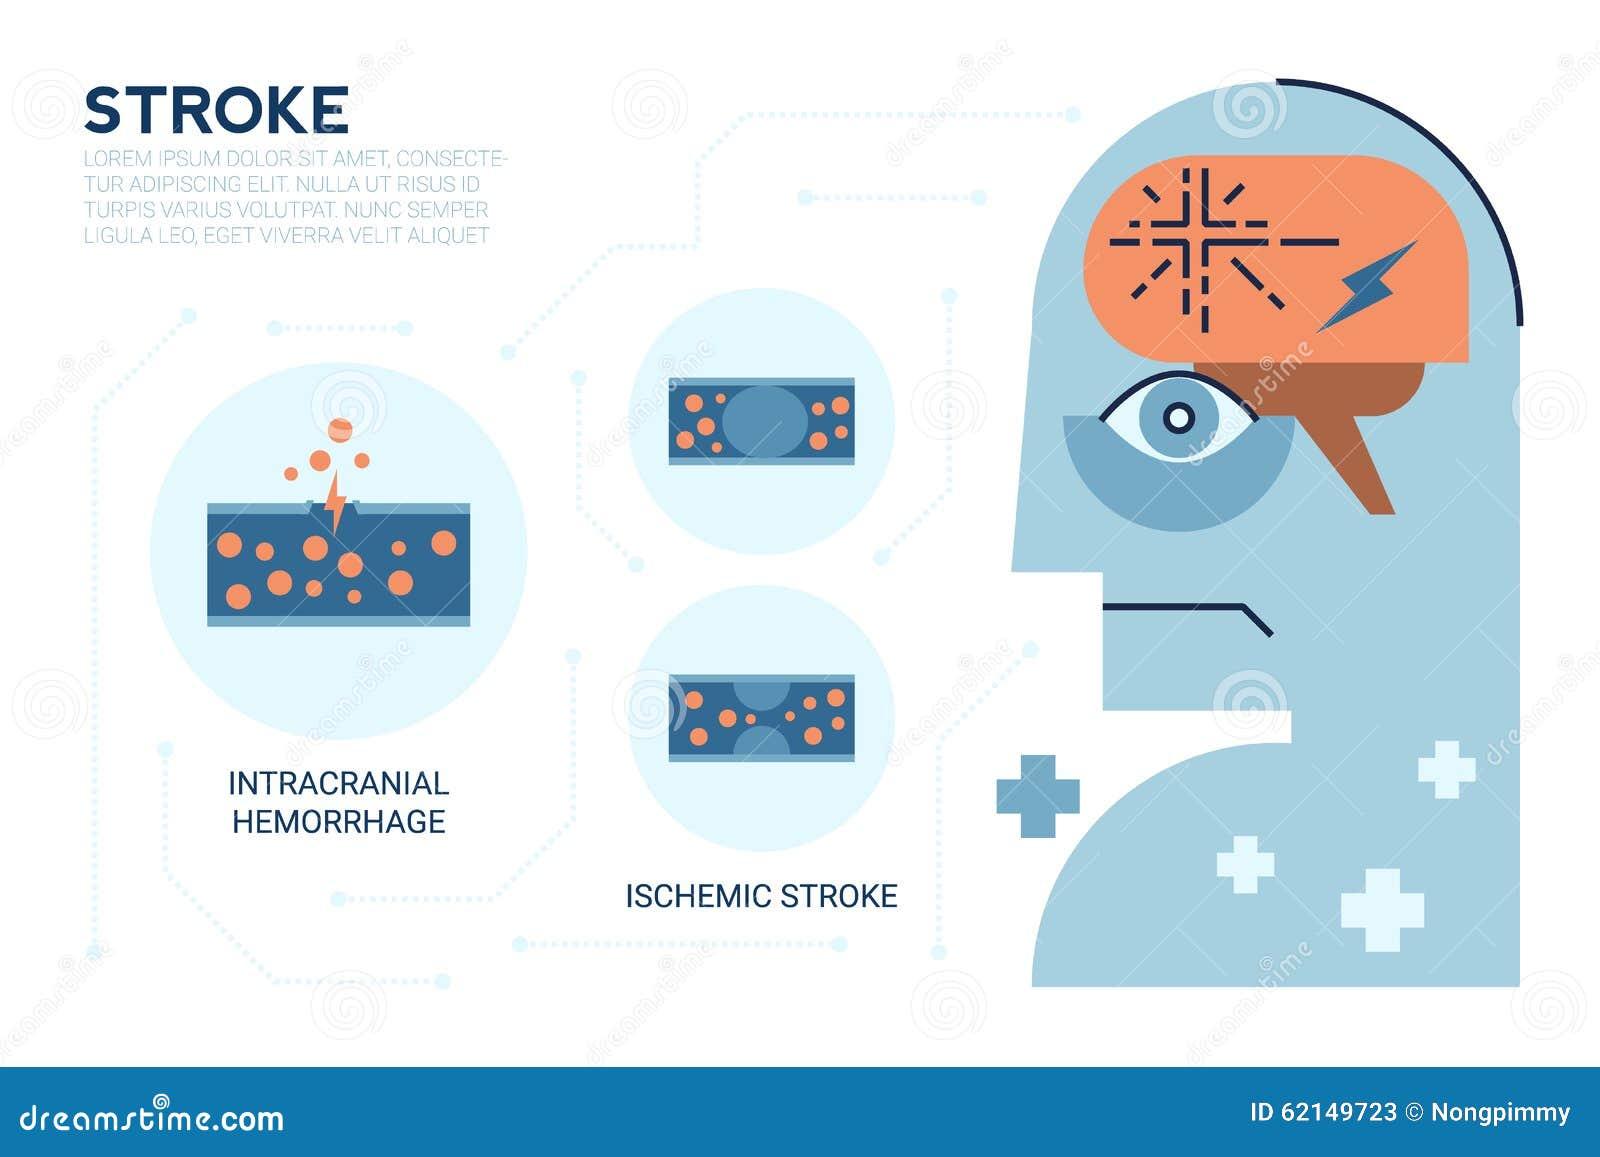 stroke brain disease stock vector illustration of ischemic 62149723